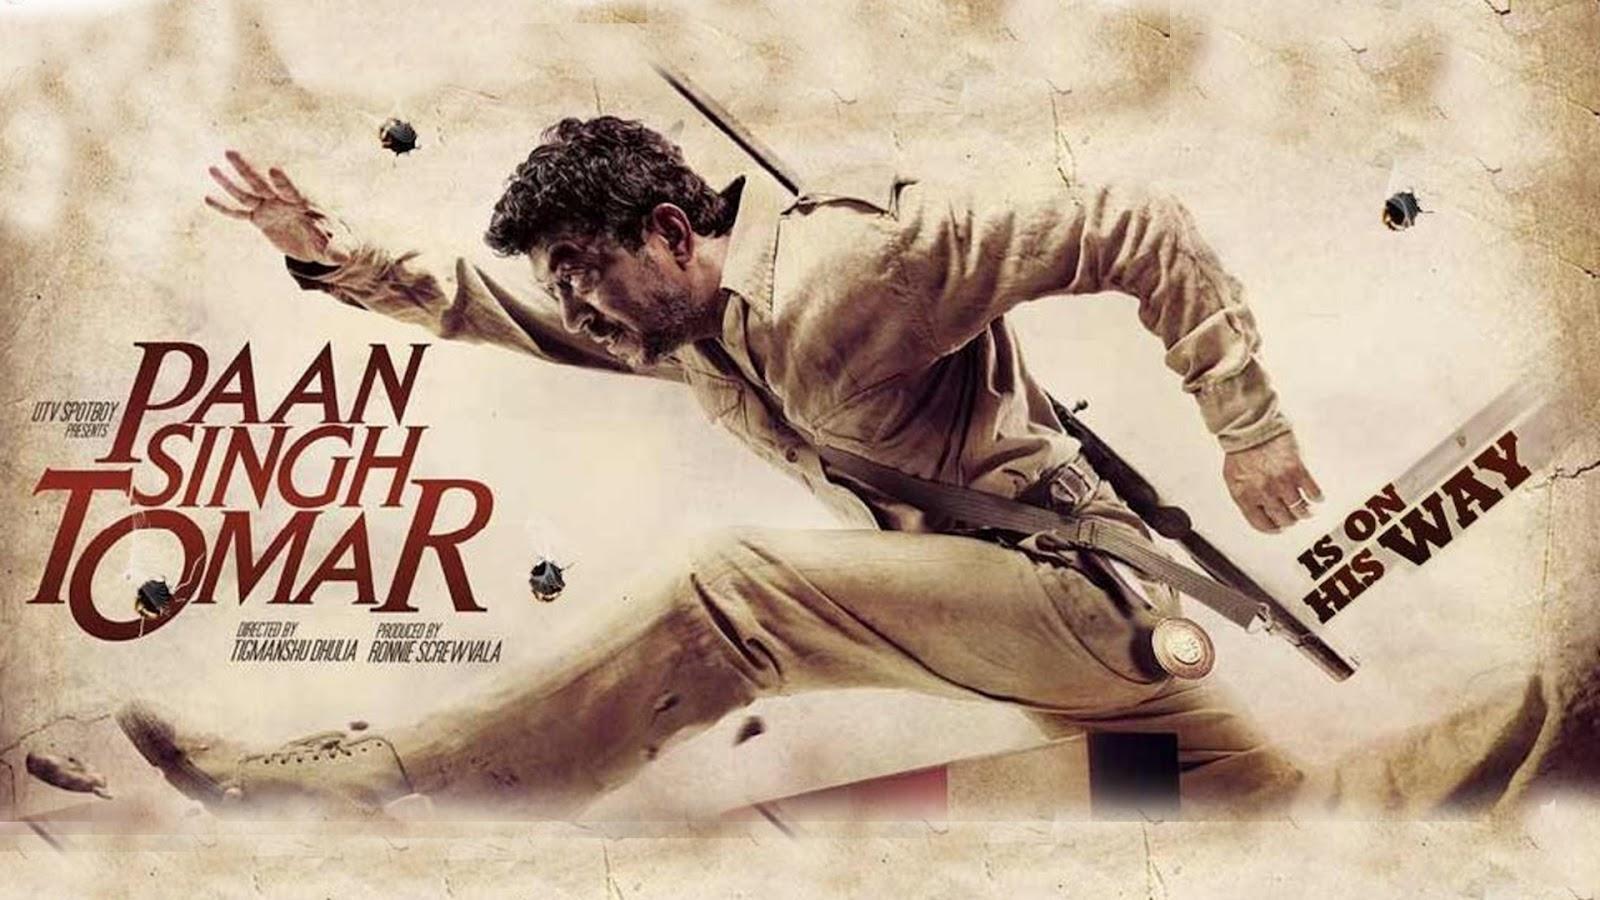 http://3.bp.blogspot.com/-IfZDzKCLYiI/UN0ufYYHRMI/AAAAAAAAEhQ/lvMX4-_zjyM/s1600/Paan-Singh-Tomar-movie-wallpaper-stills.jpg